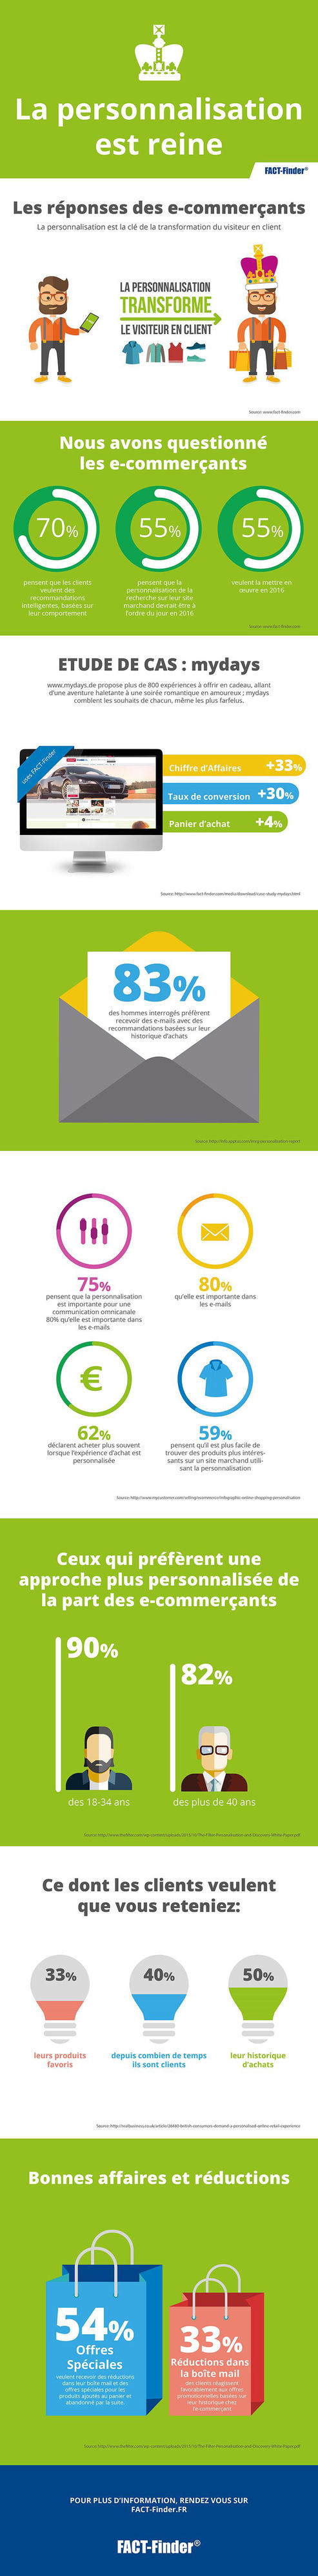 E commerce, l'infographie